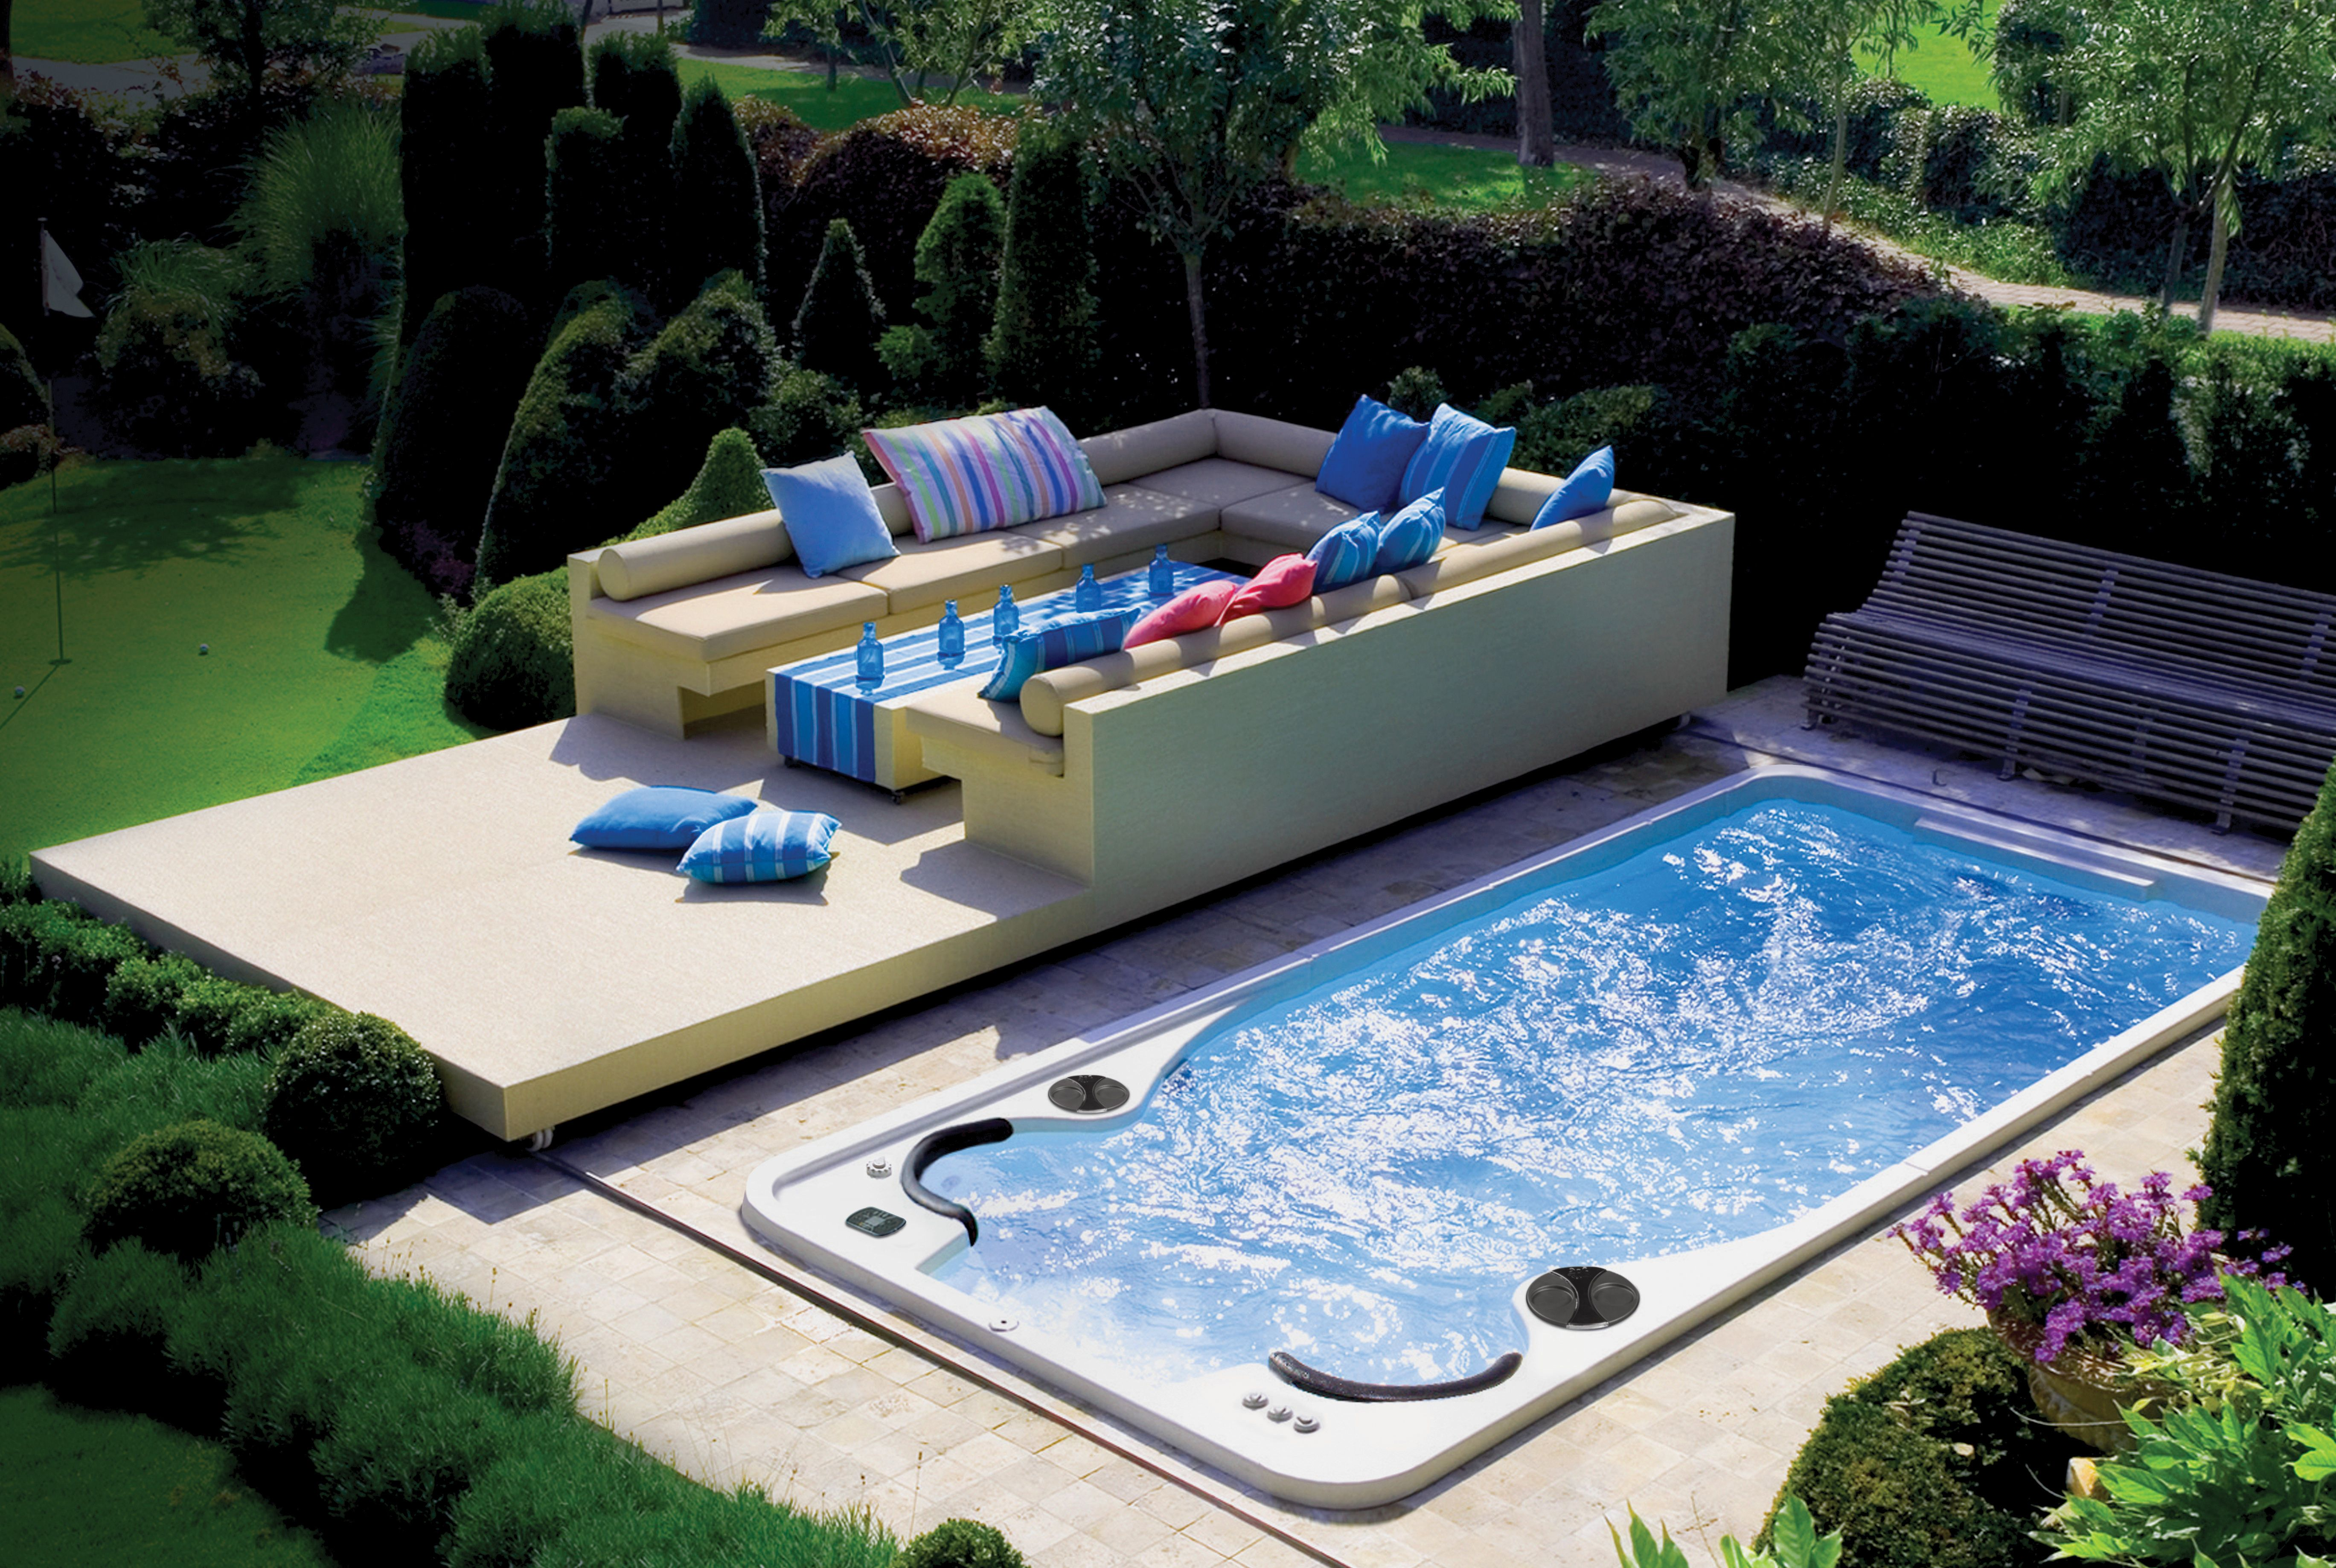 Like All Hydropool Swim Spas The 17fx Aquasport Can Be Shipped